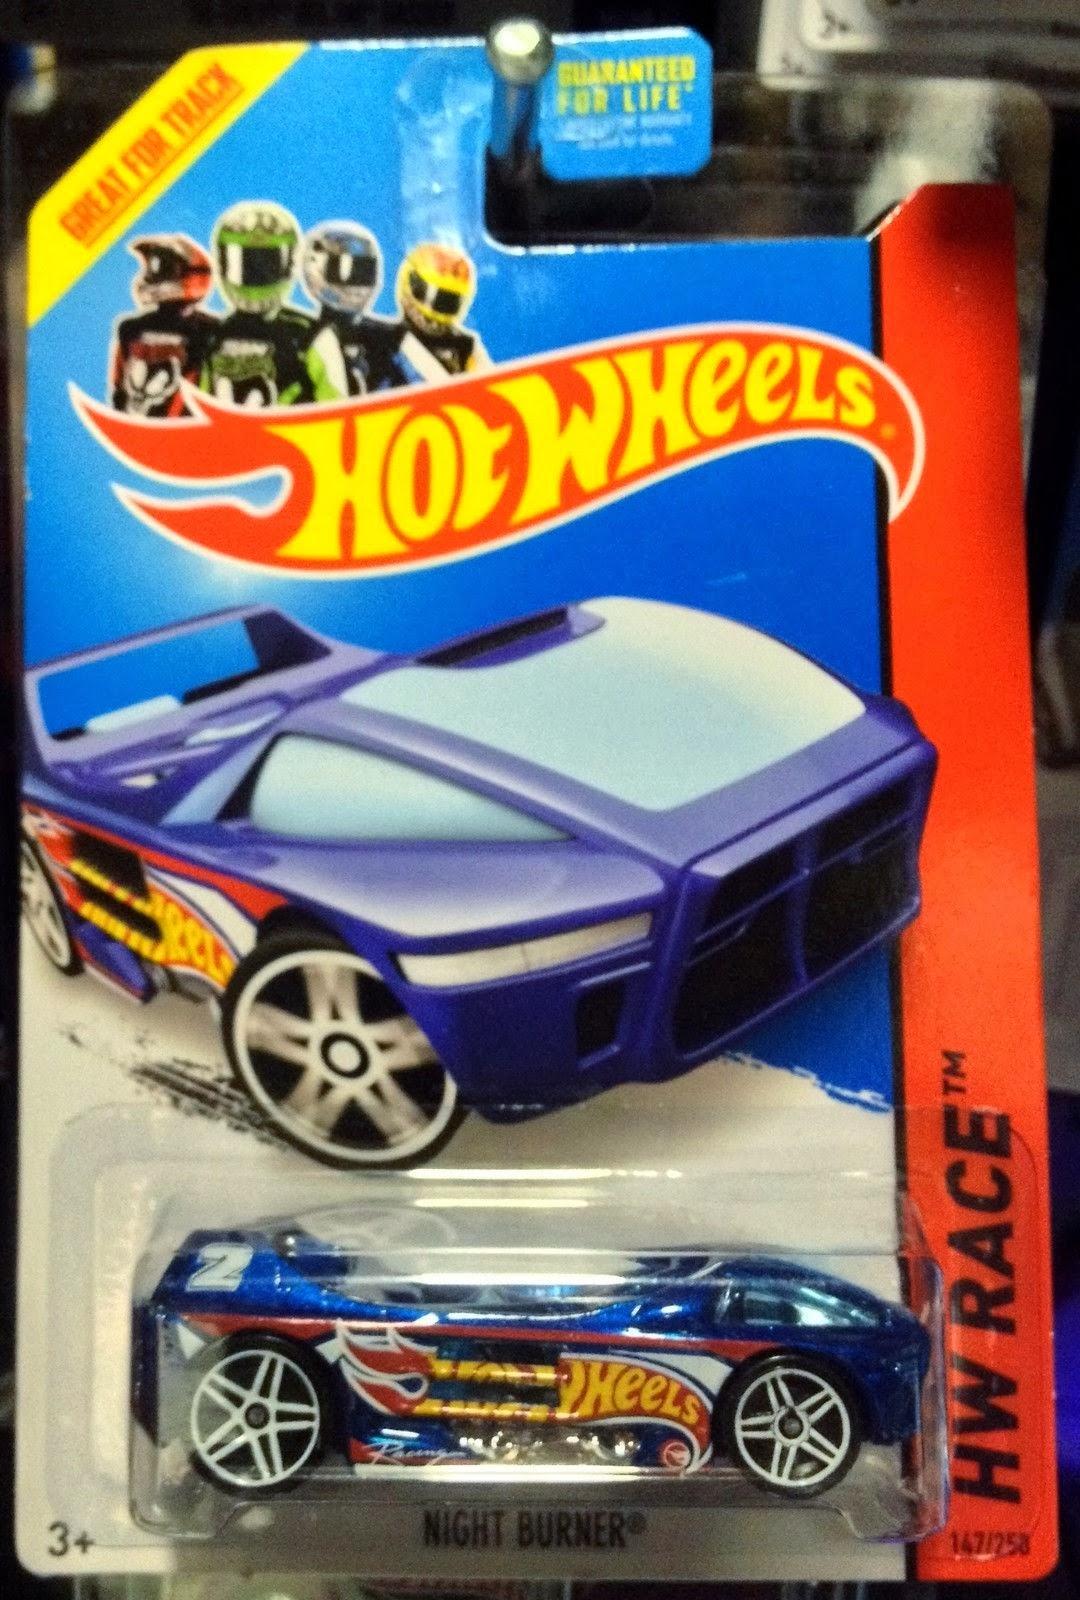 2014 Hot Wheels Treasure Hunts List/Set